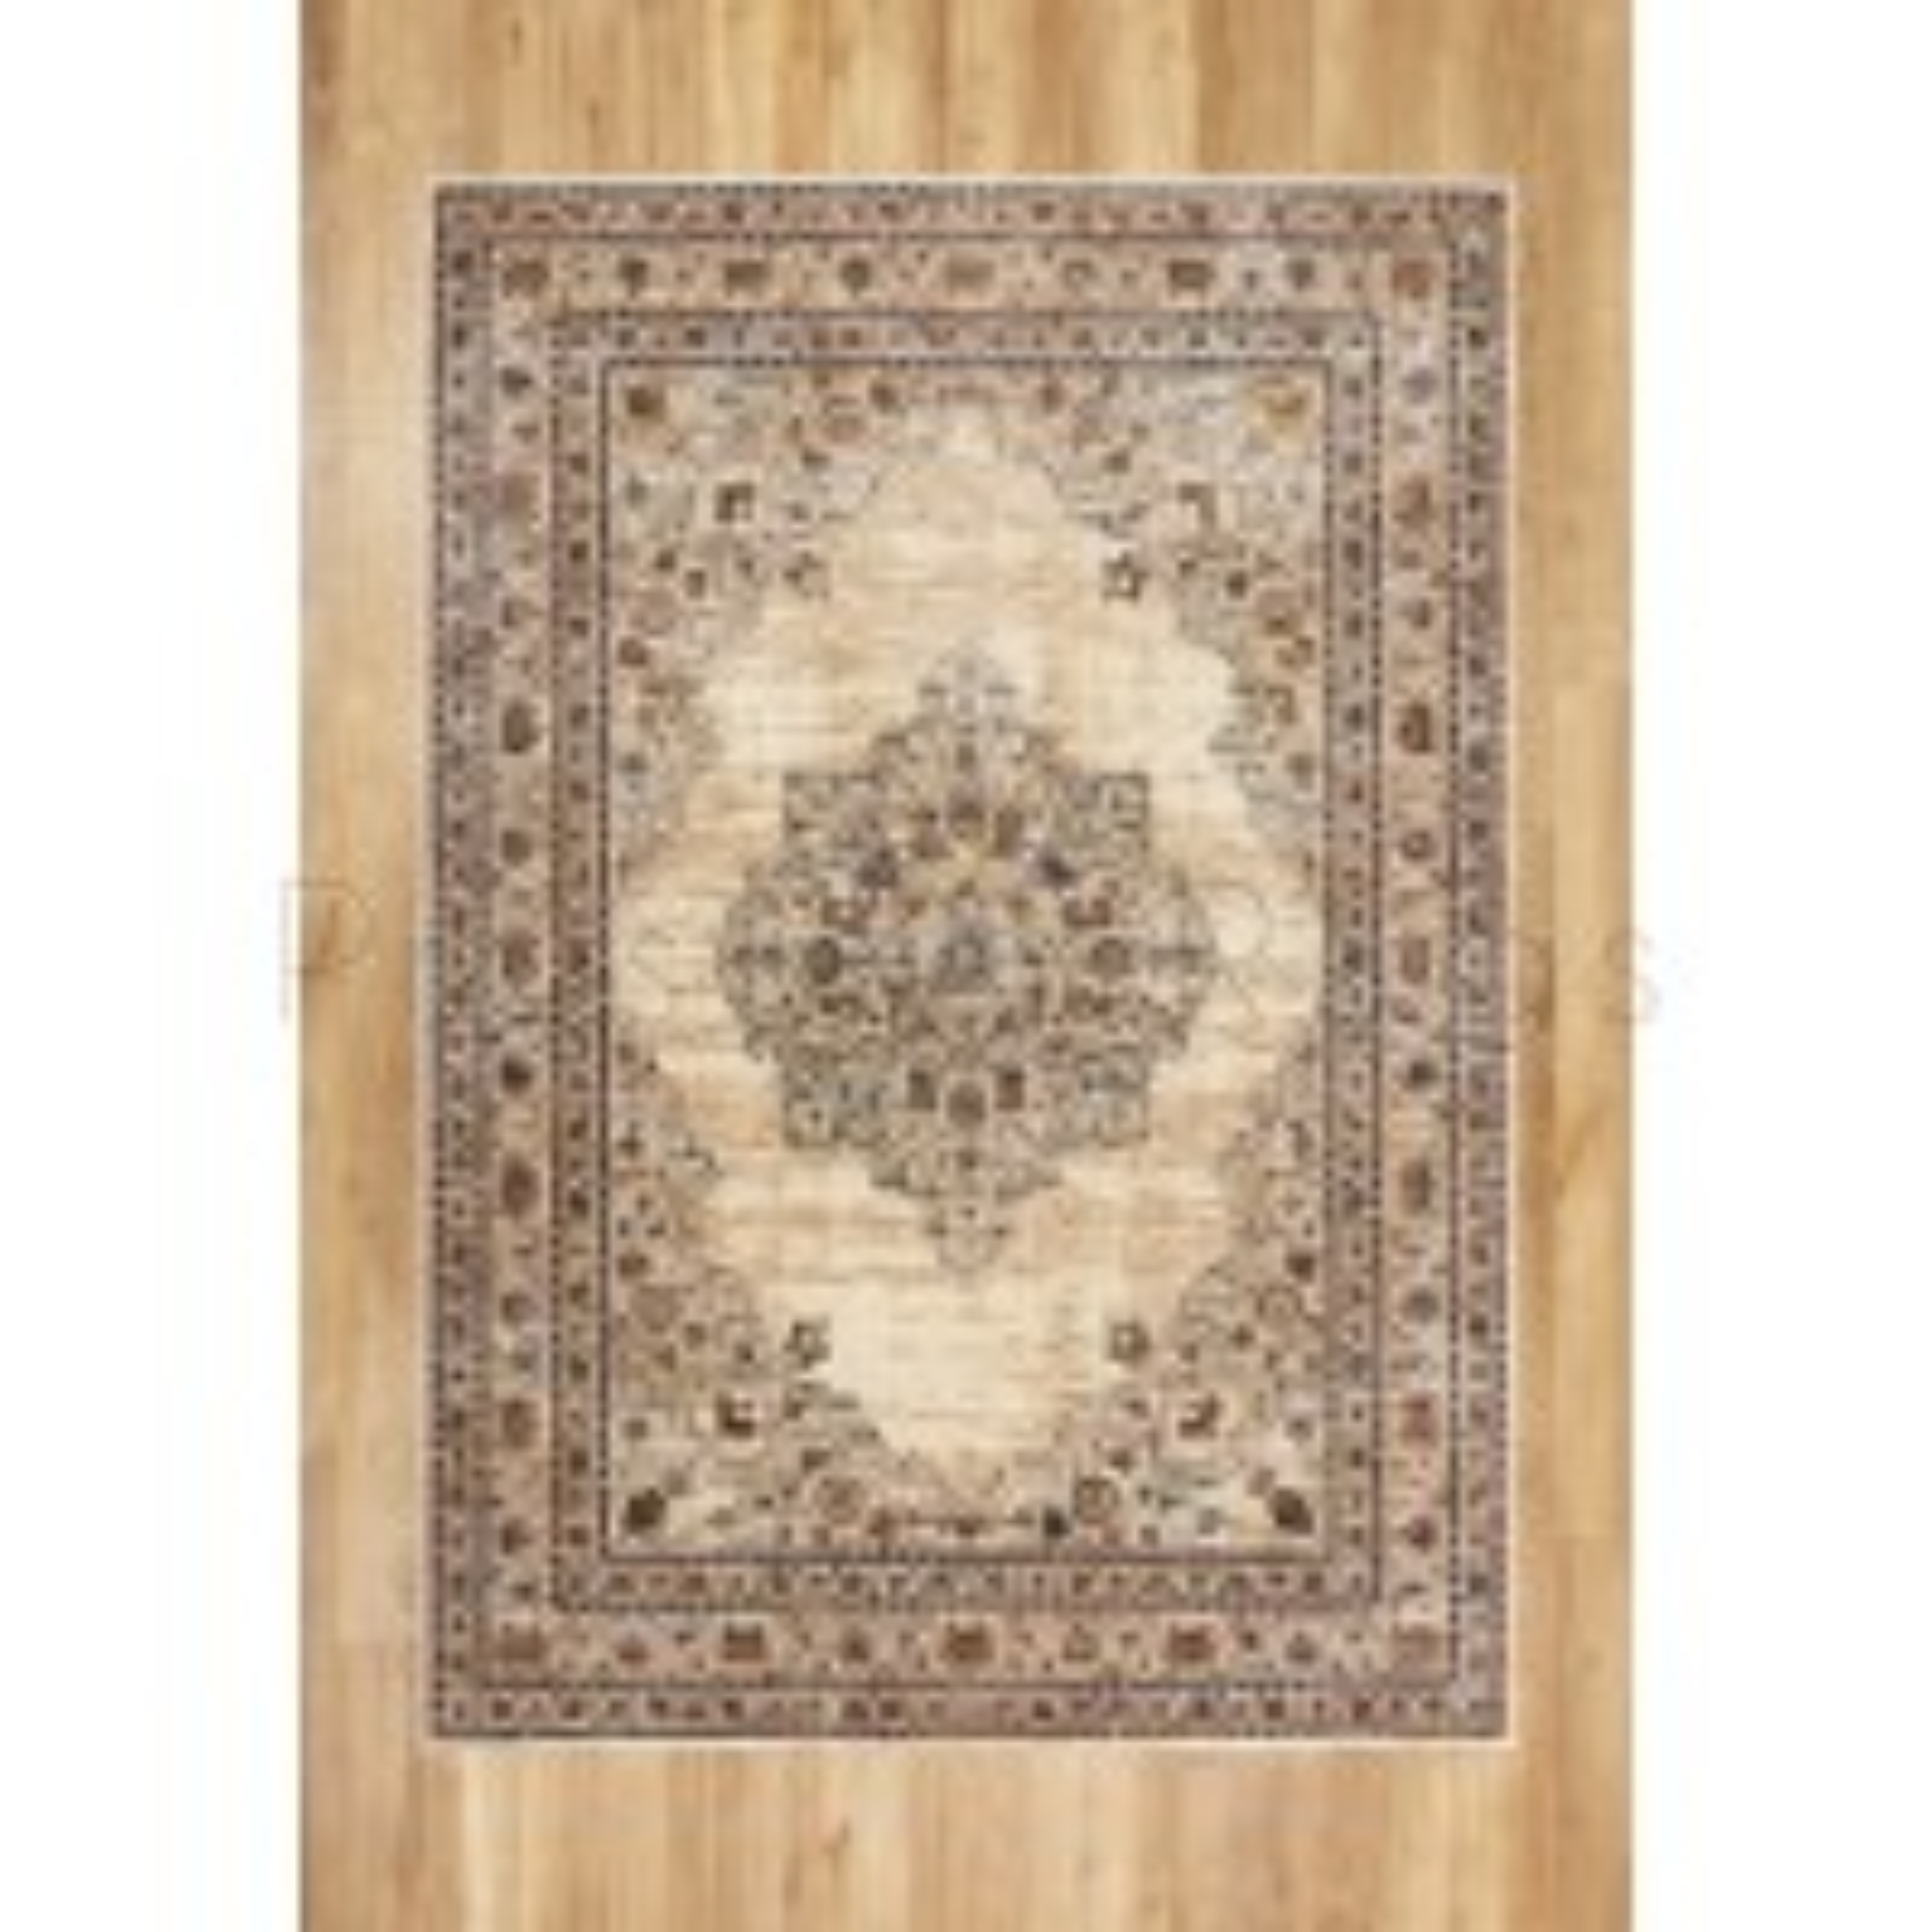 "Alhambra Traditional Rug - 6345c ivory/beige - Size 80 x 150 cm (2'8"" x 5')"